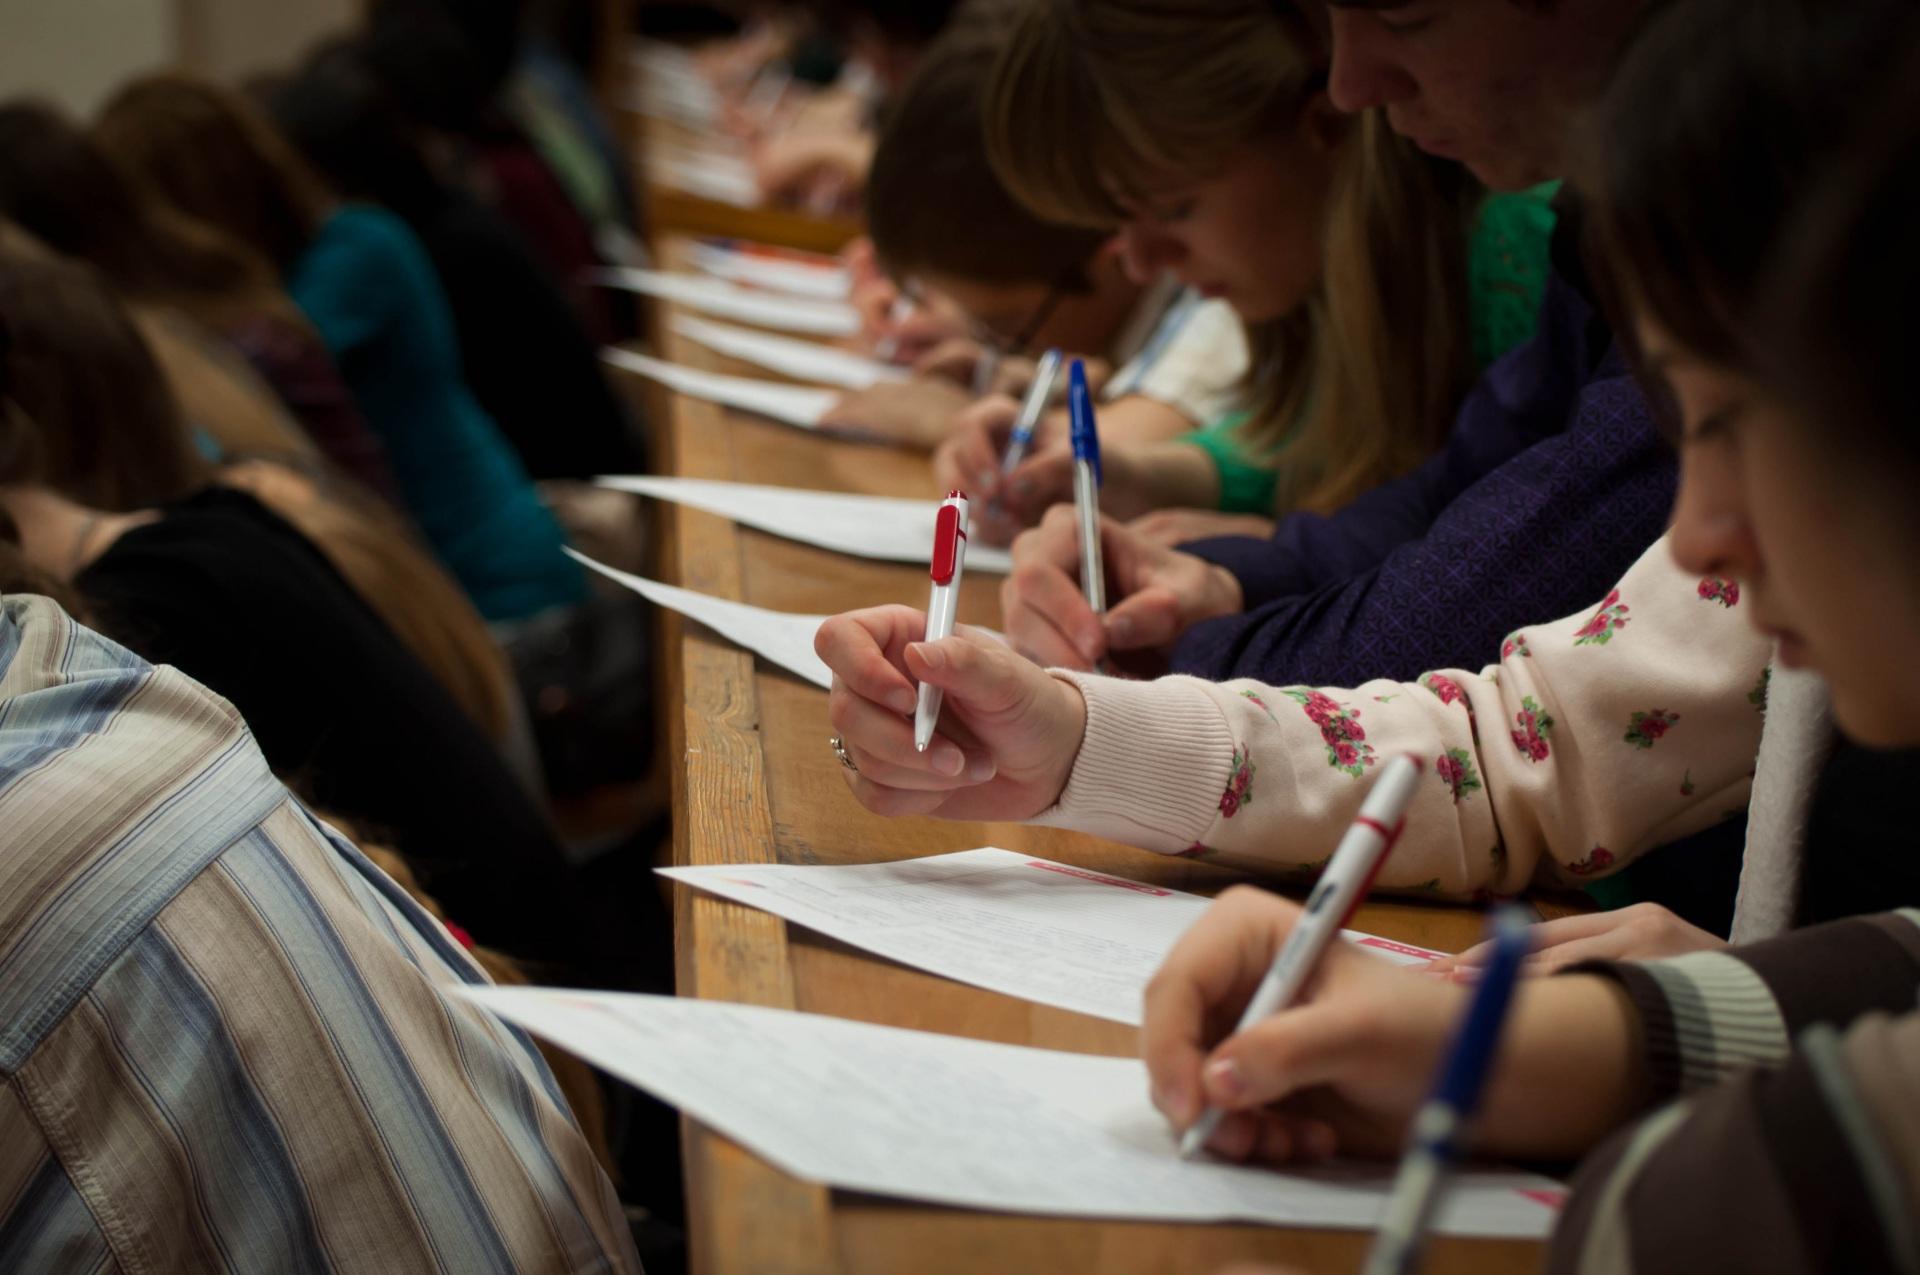 Завтра в Москве напишут диктант на коми языке